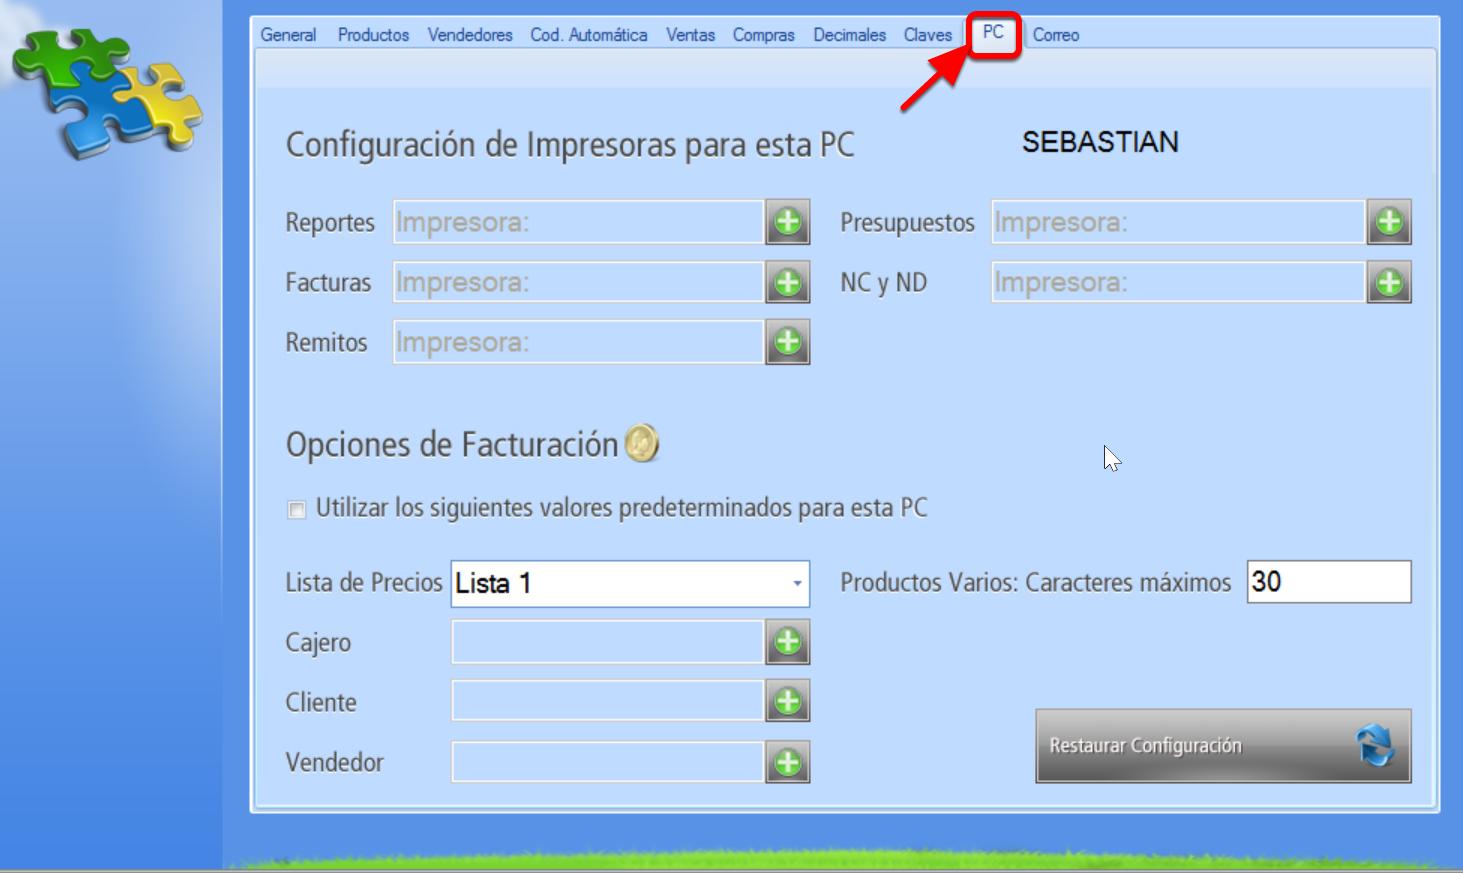 Pesta帽a PC en configuracion